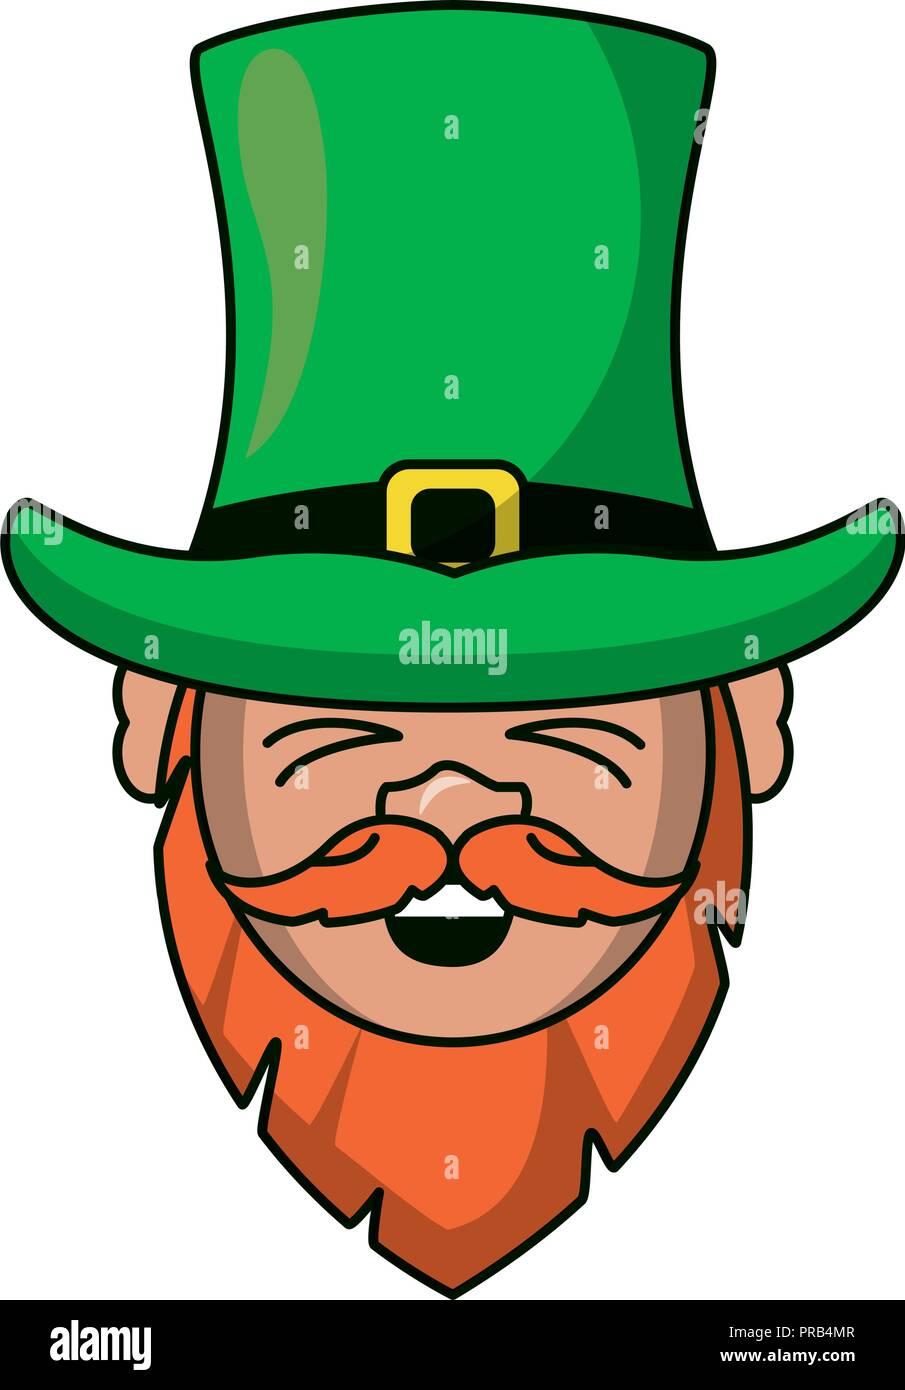 91de54b9914c5 Irish elf face cartoon Stock Vector Art   Illustration